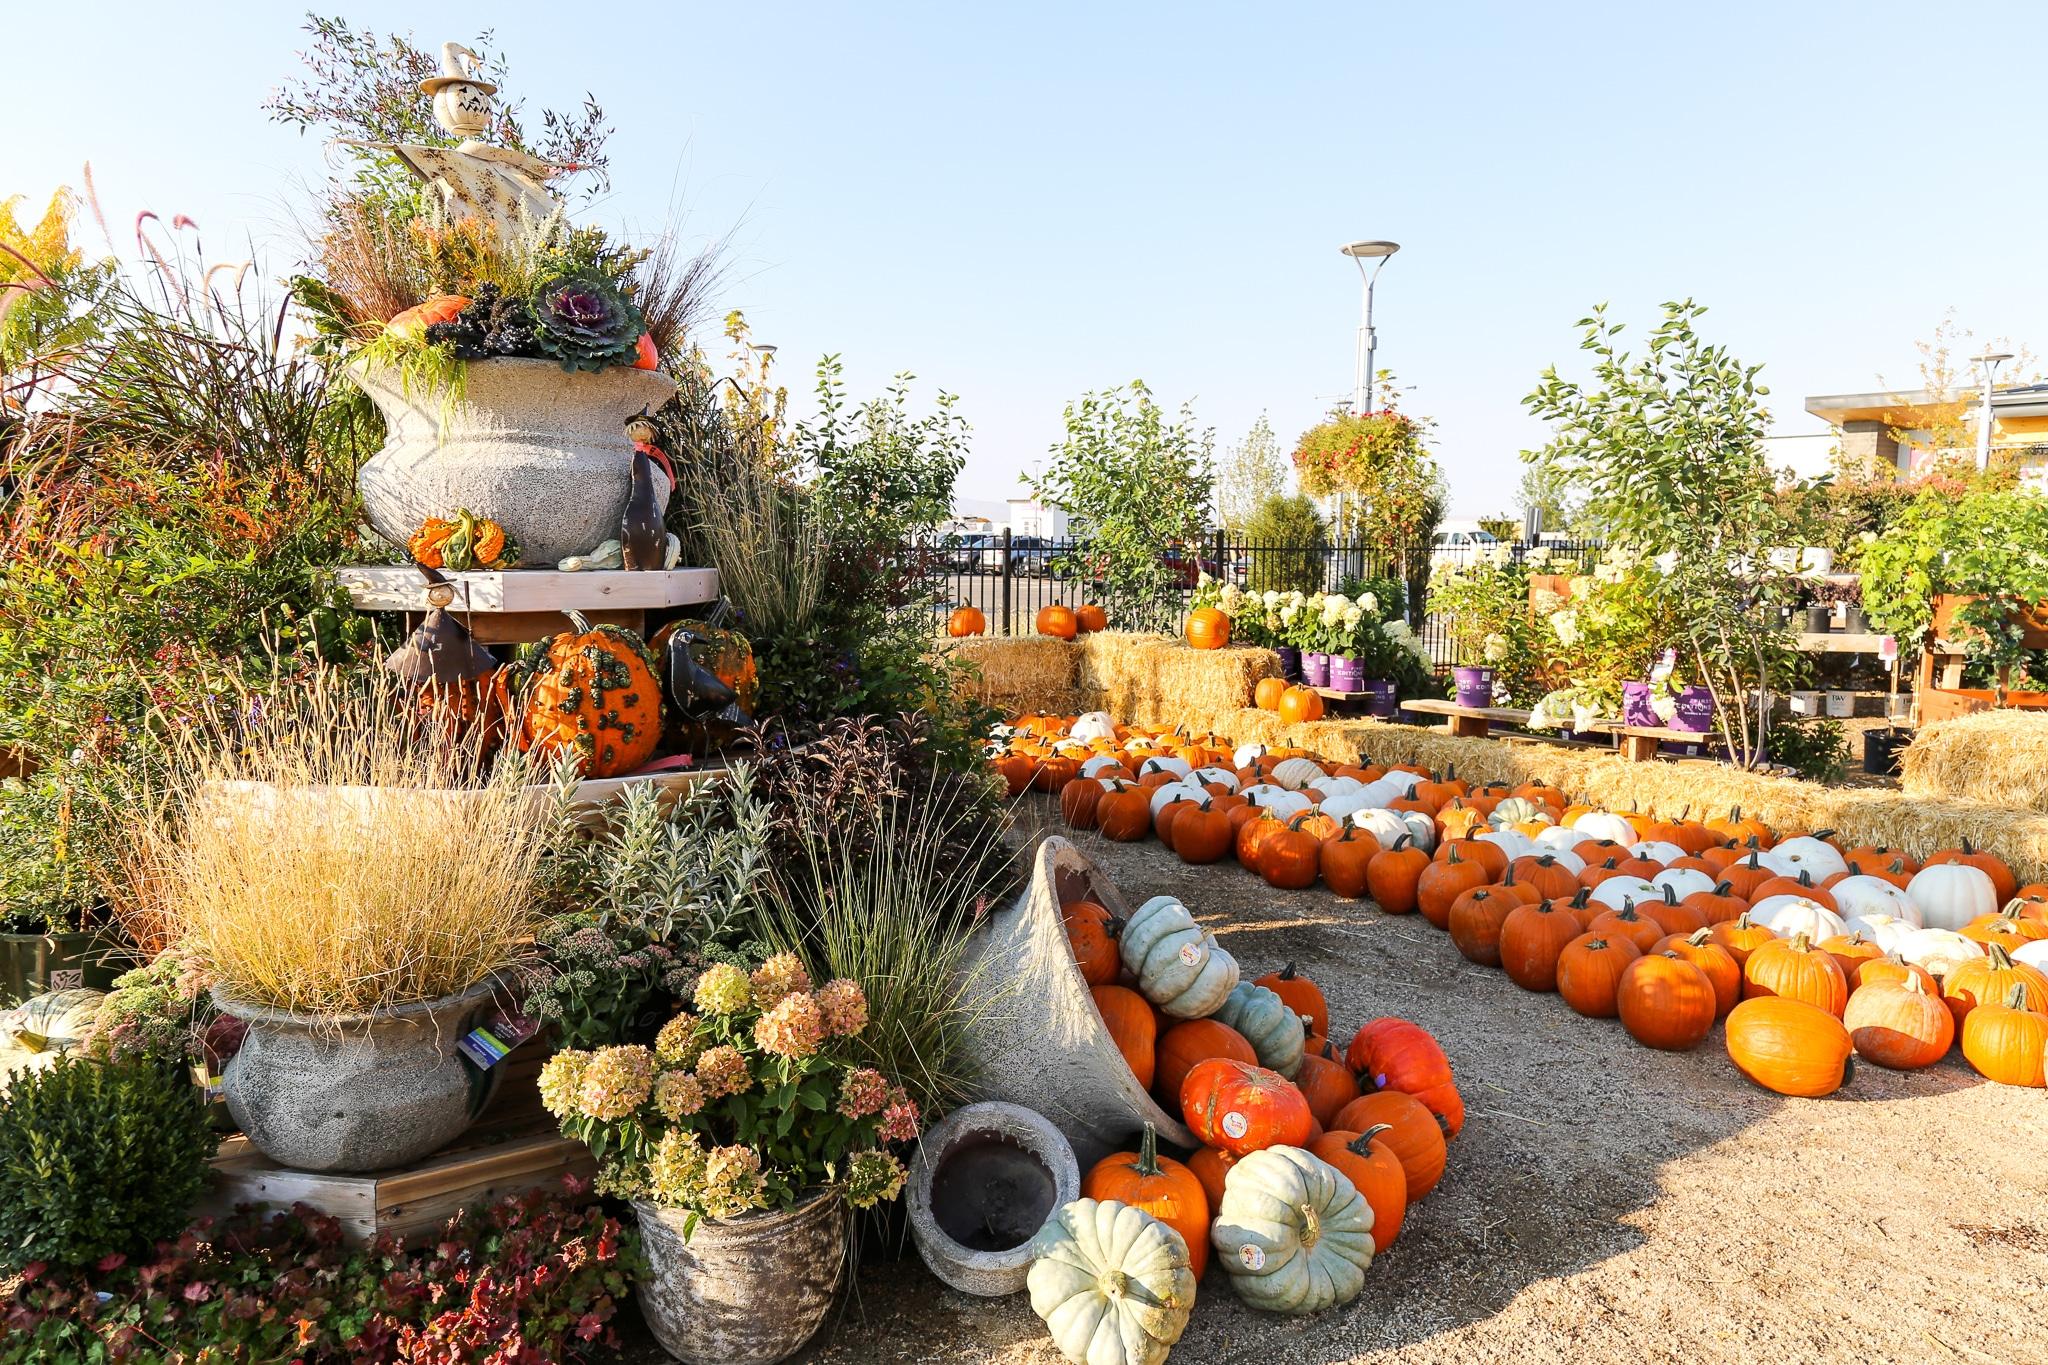 Pumpkins at Franz Witte